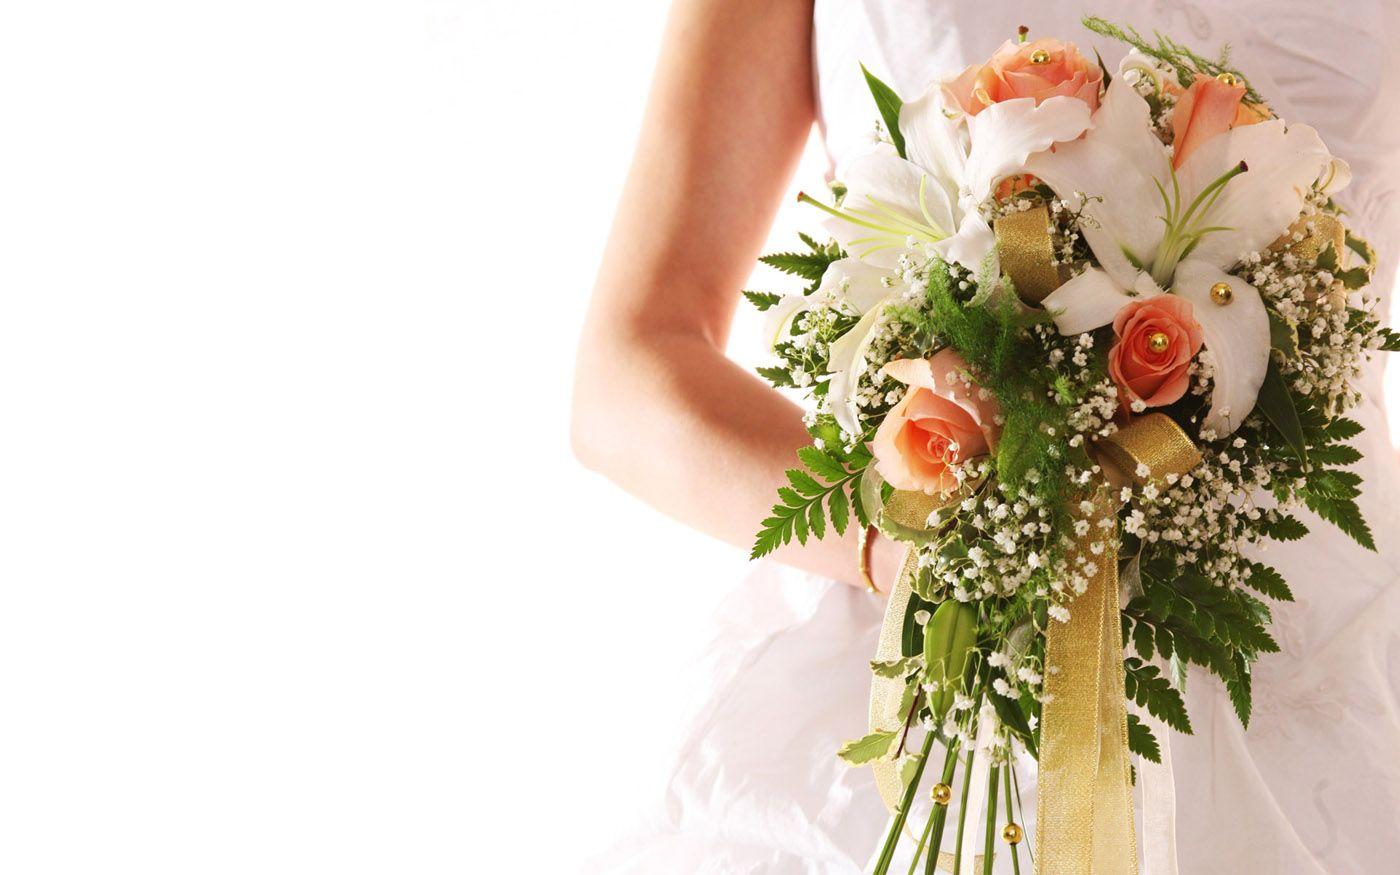 Wedding Flowers   Wedding Bouquet Ideas   Pinterest   Wedding flower ...